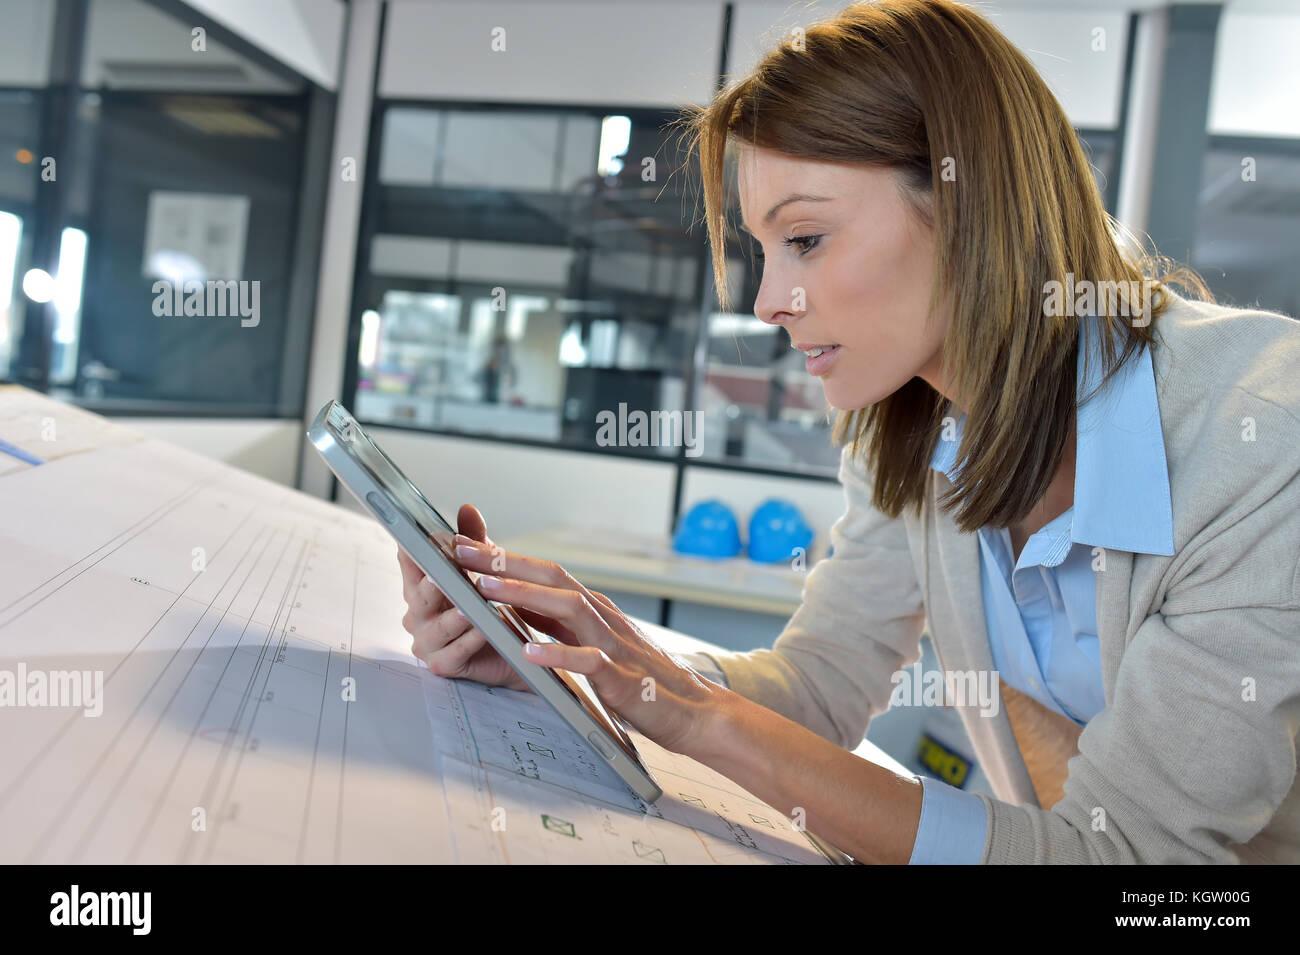 Woman engineer working on digital tablet - Stock Image